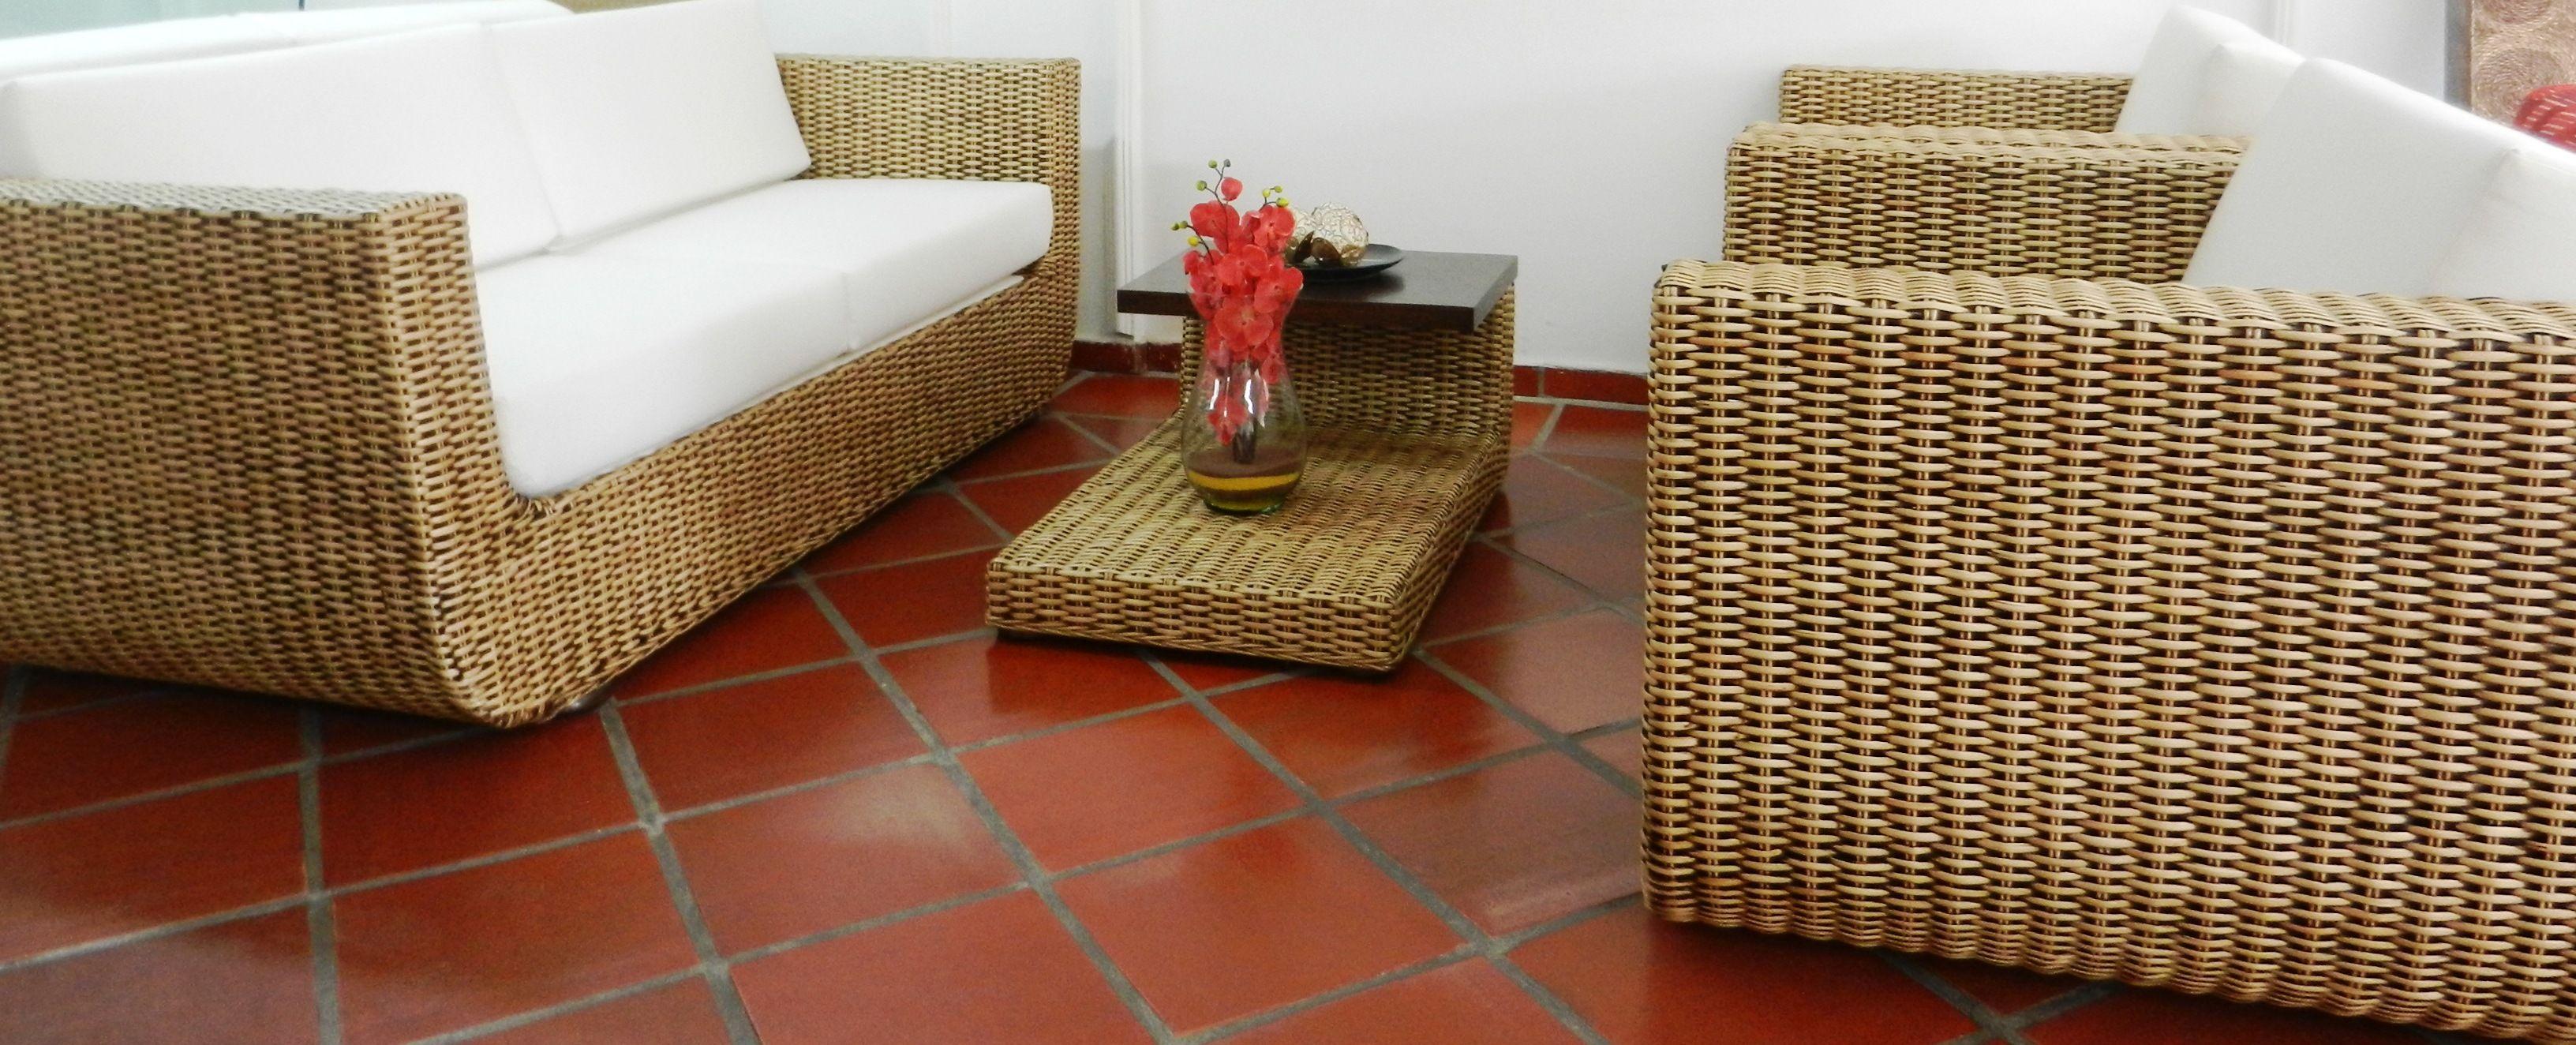 Rattambu Muebles De Rattan Y Bambu Barranquilla Colombia  # Muebles De Bejuco